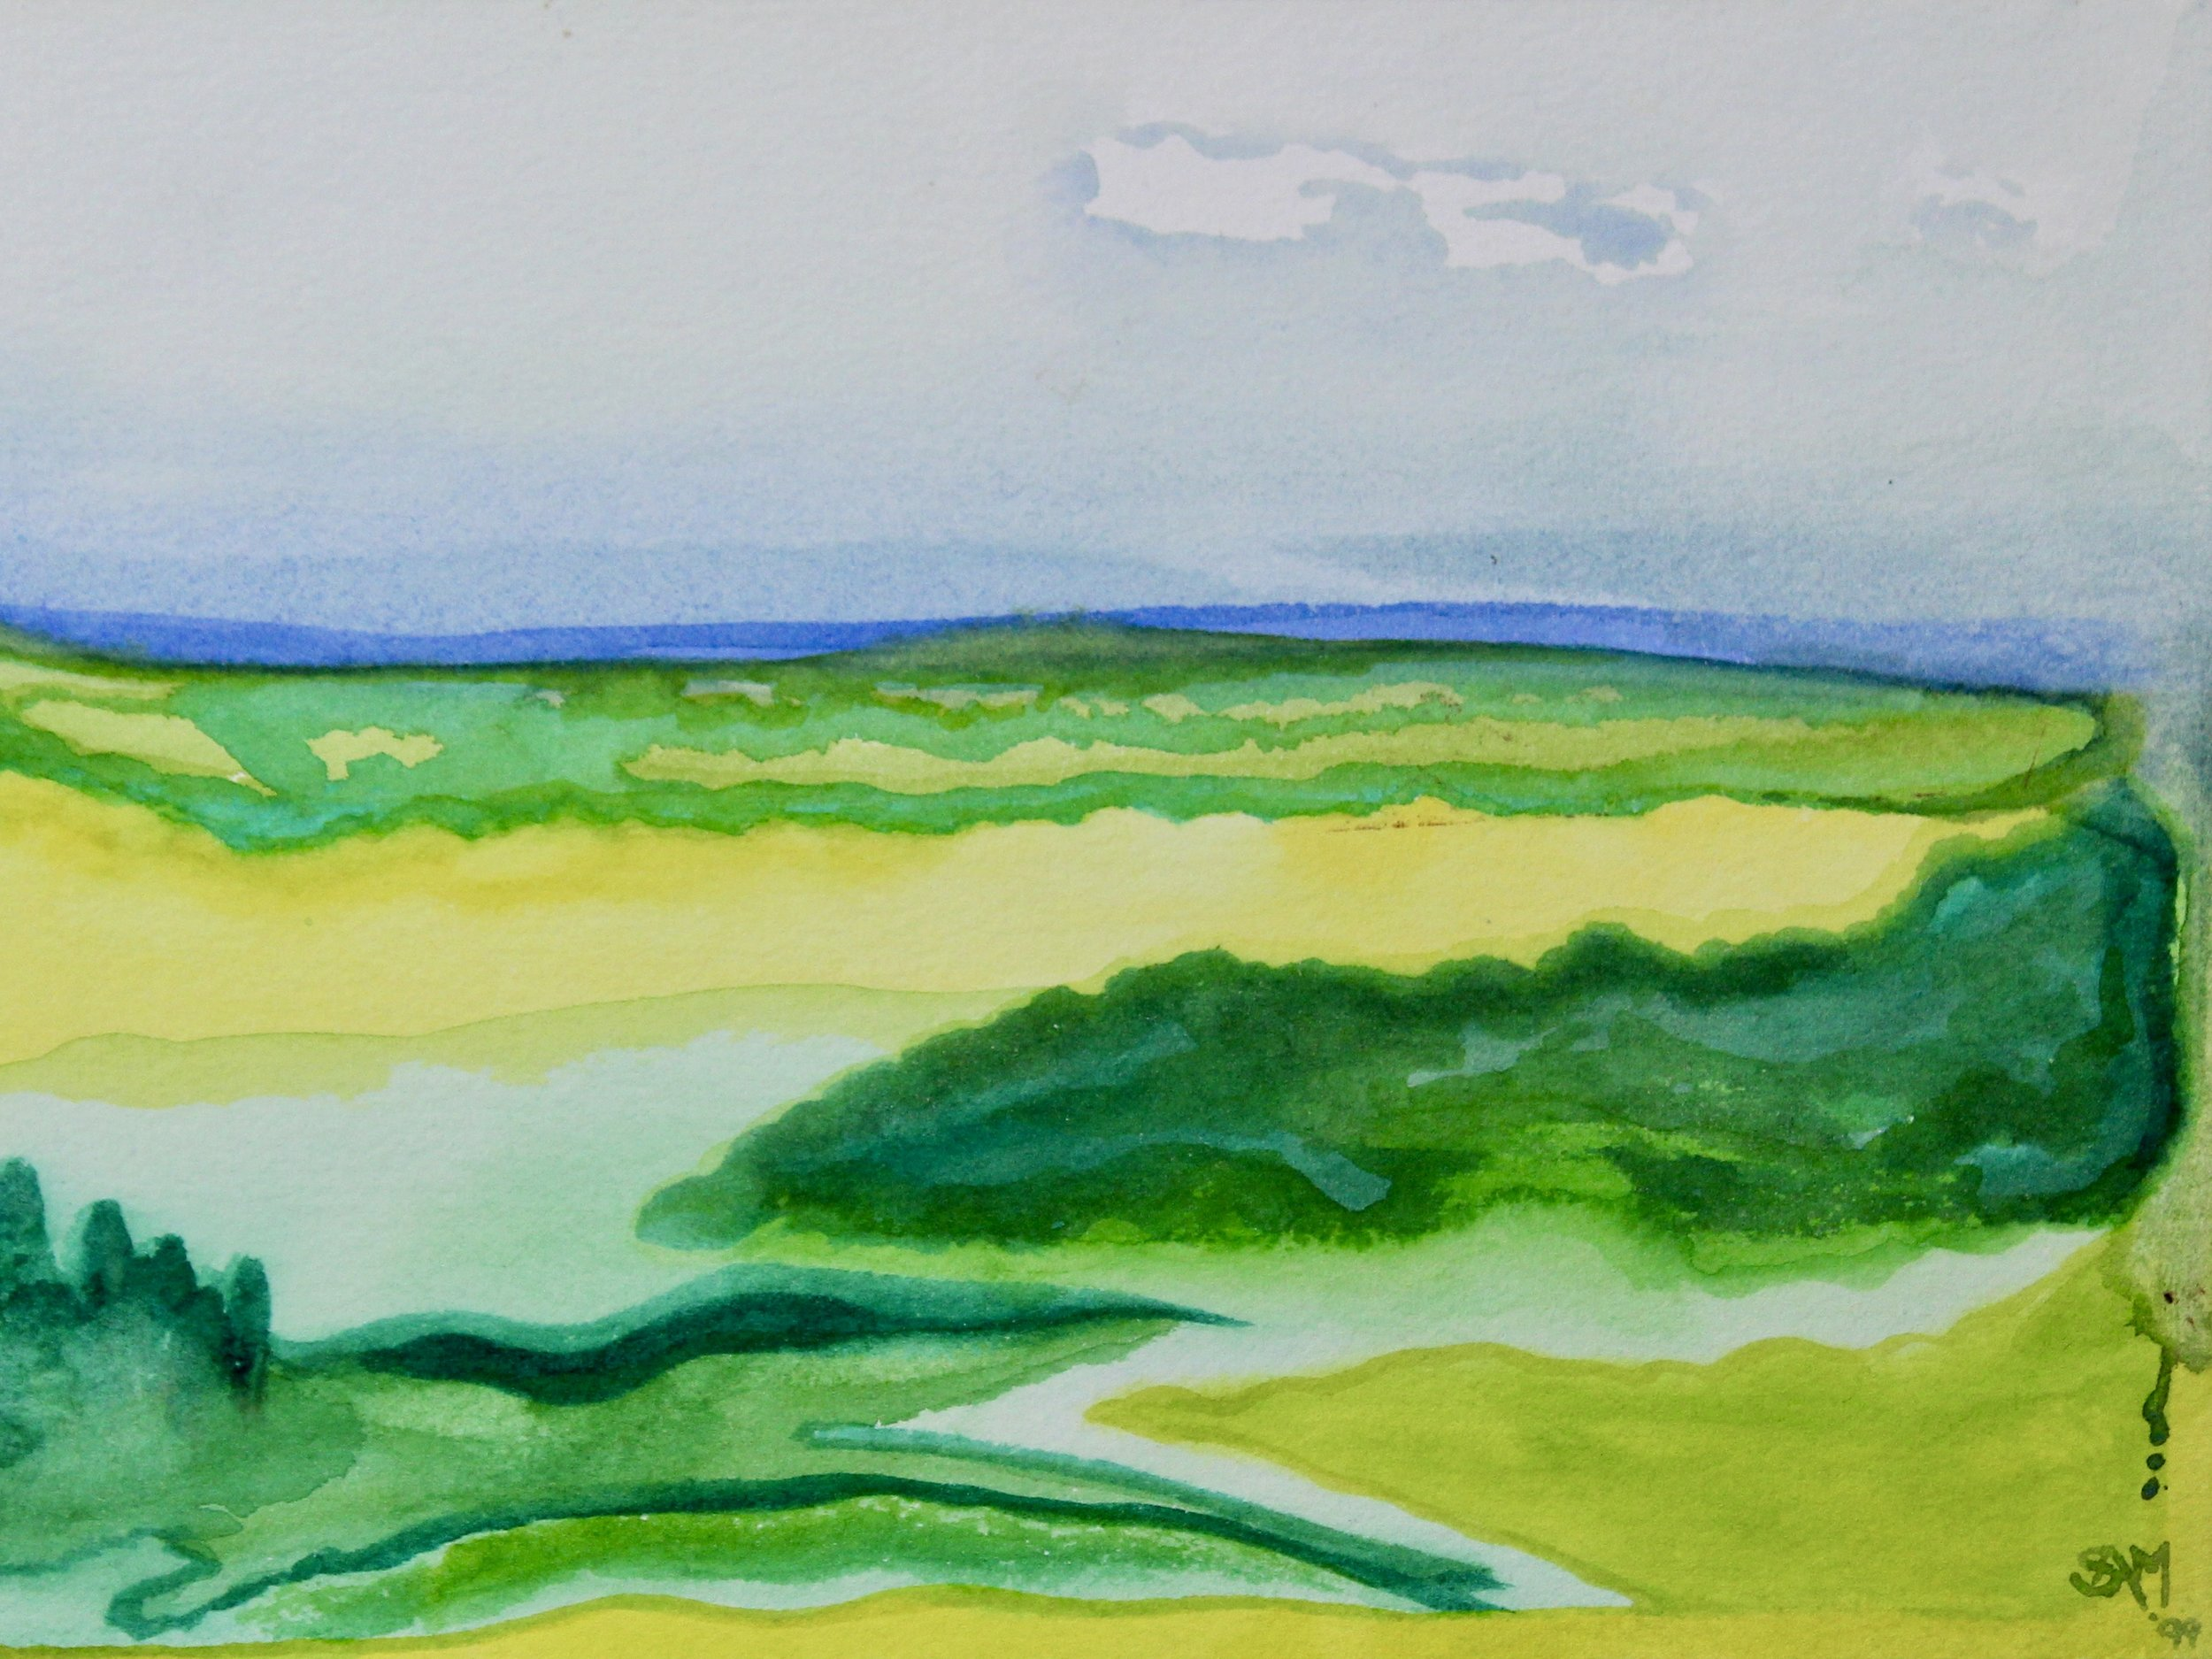 Mansfield 6 -  1999 watercolour on paper 20cm x 26cm